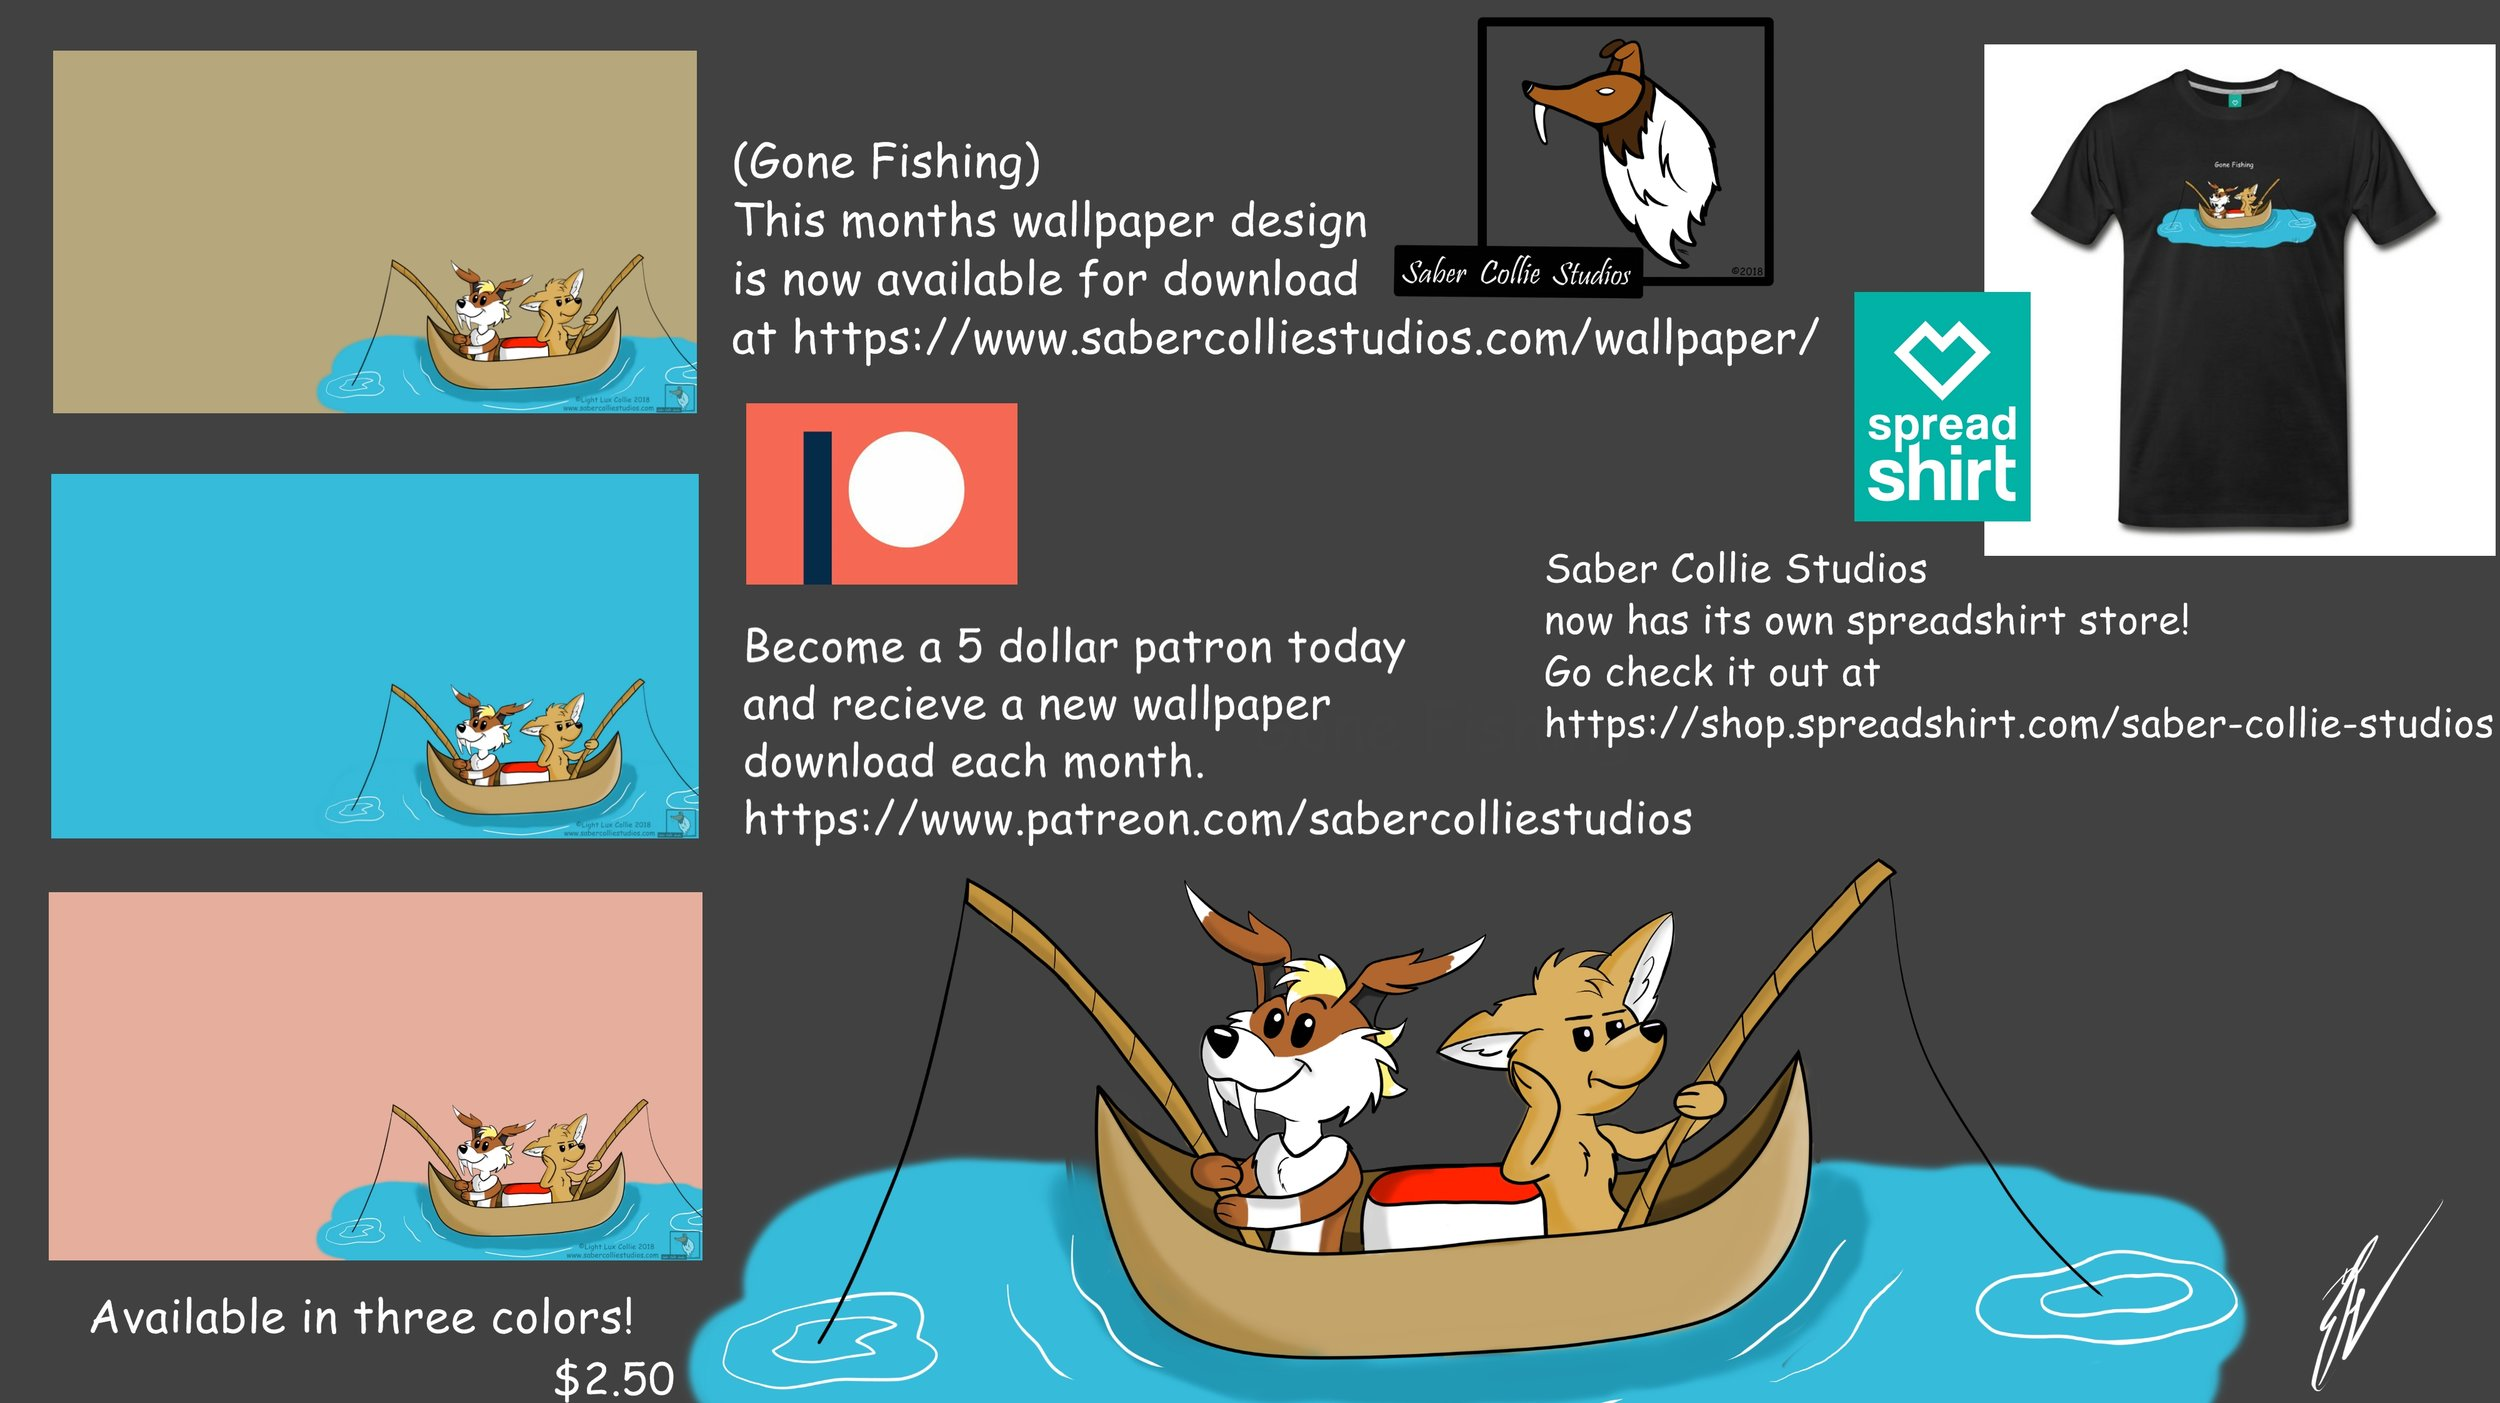 Gone Fishing Advertisment1.jpg